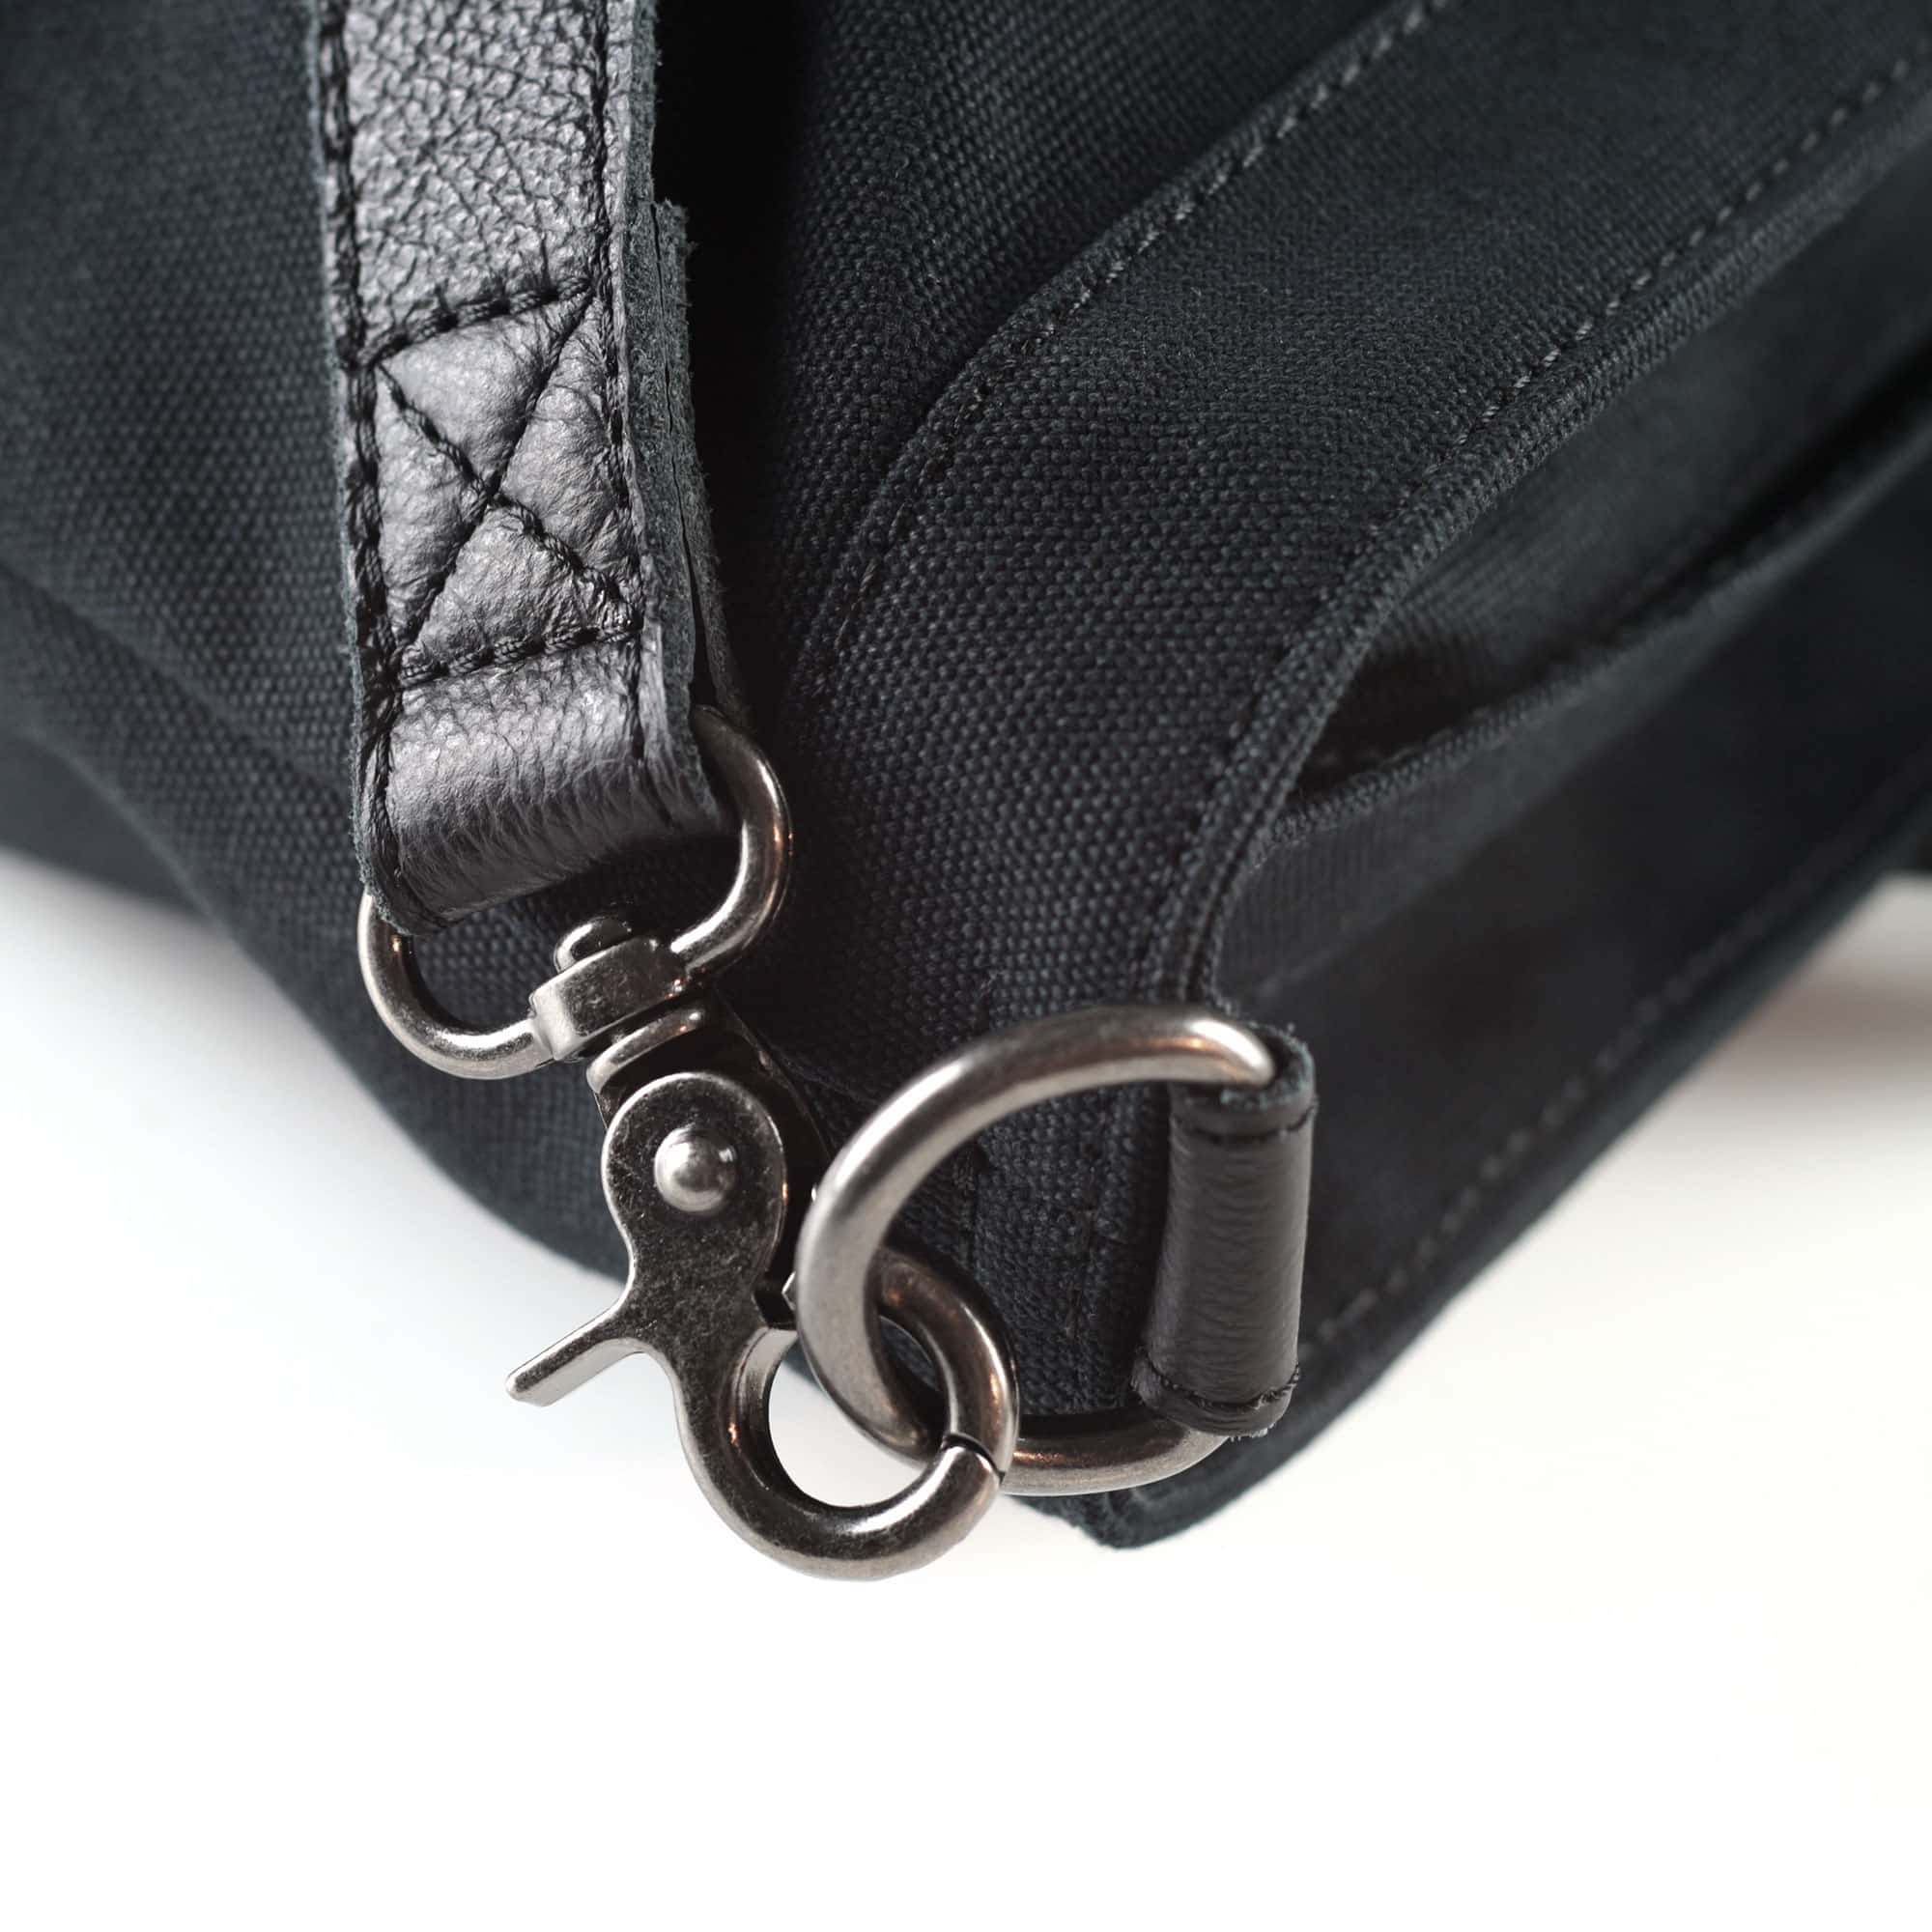 fahrradtasche-montreal shopper detail schwarz